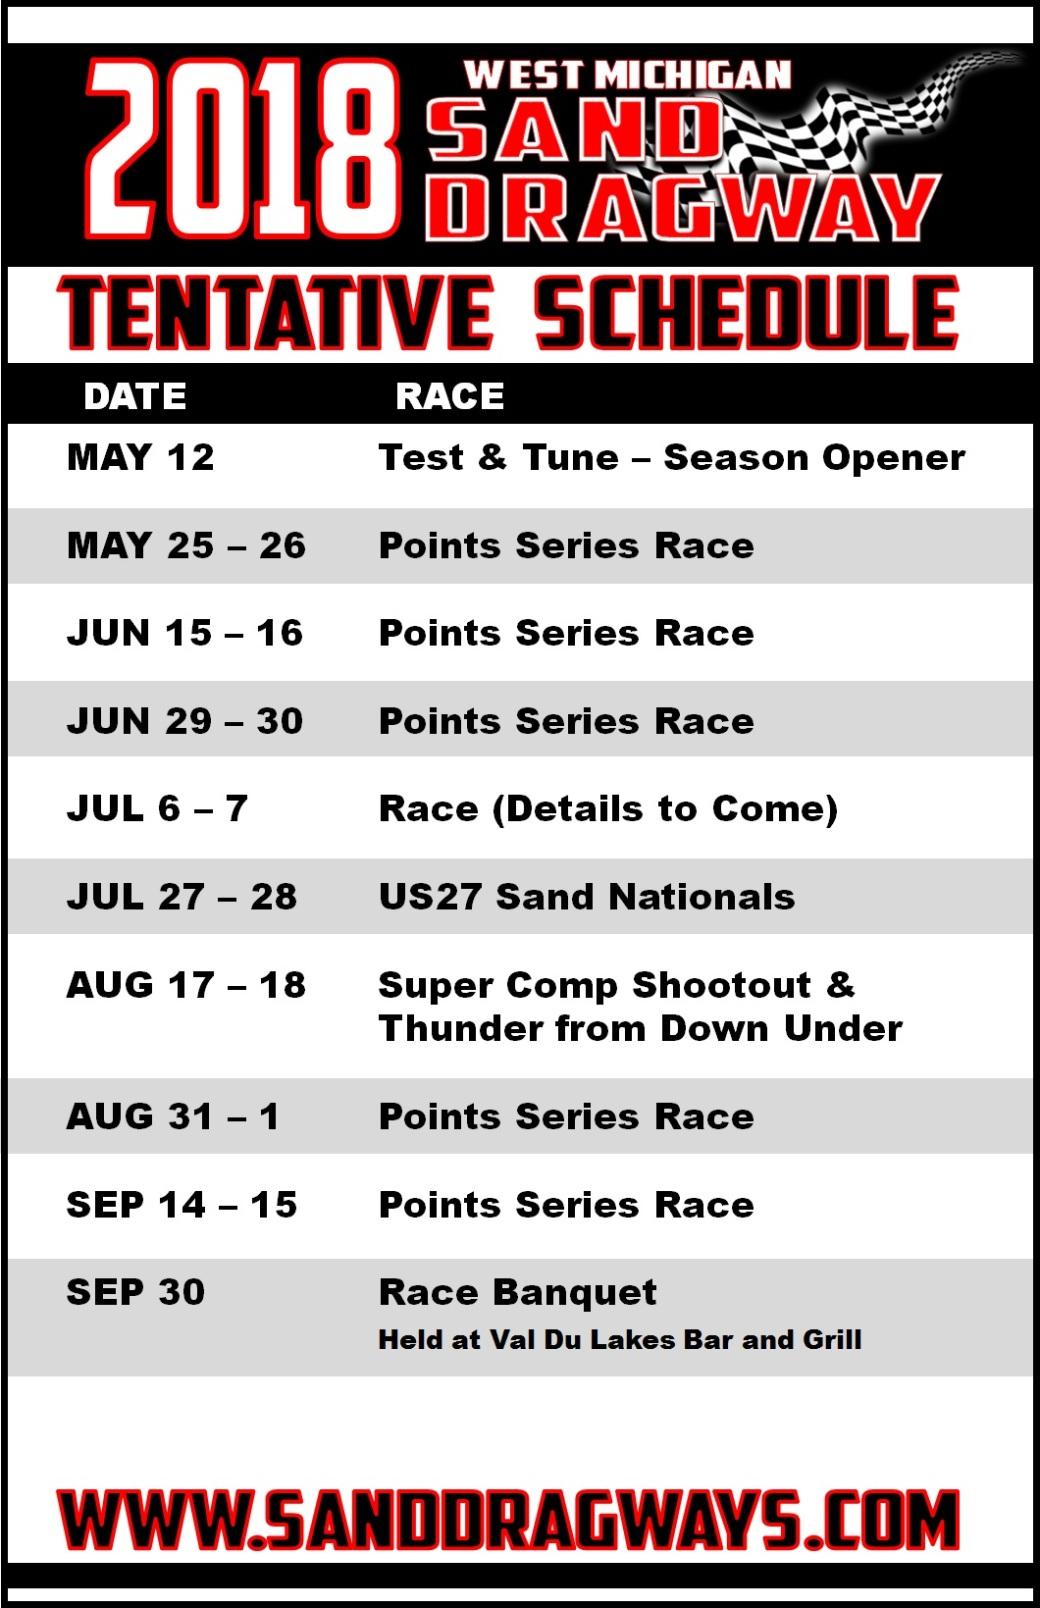 2018 WMSD Tentative Schedule